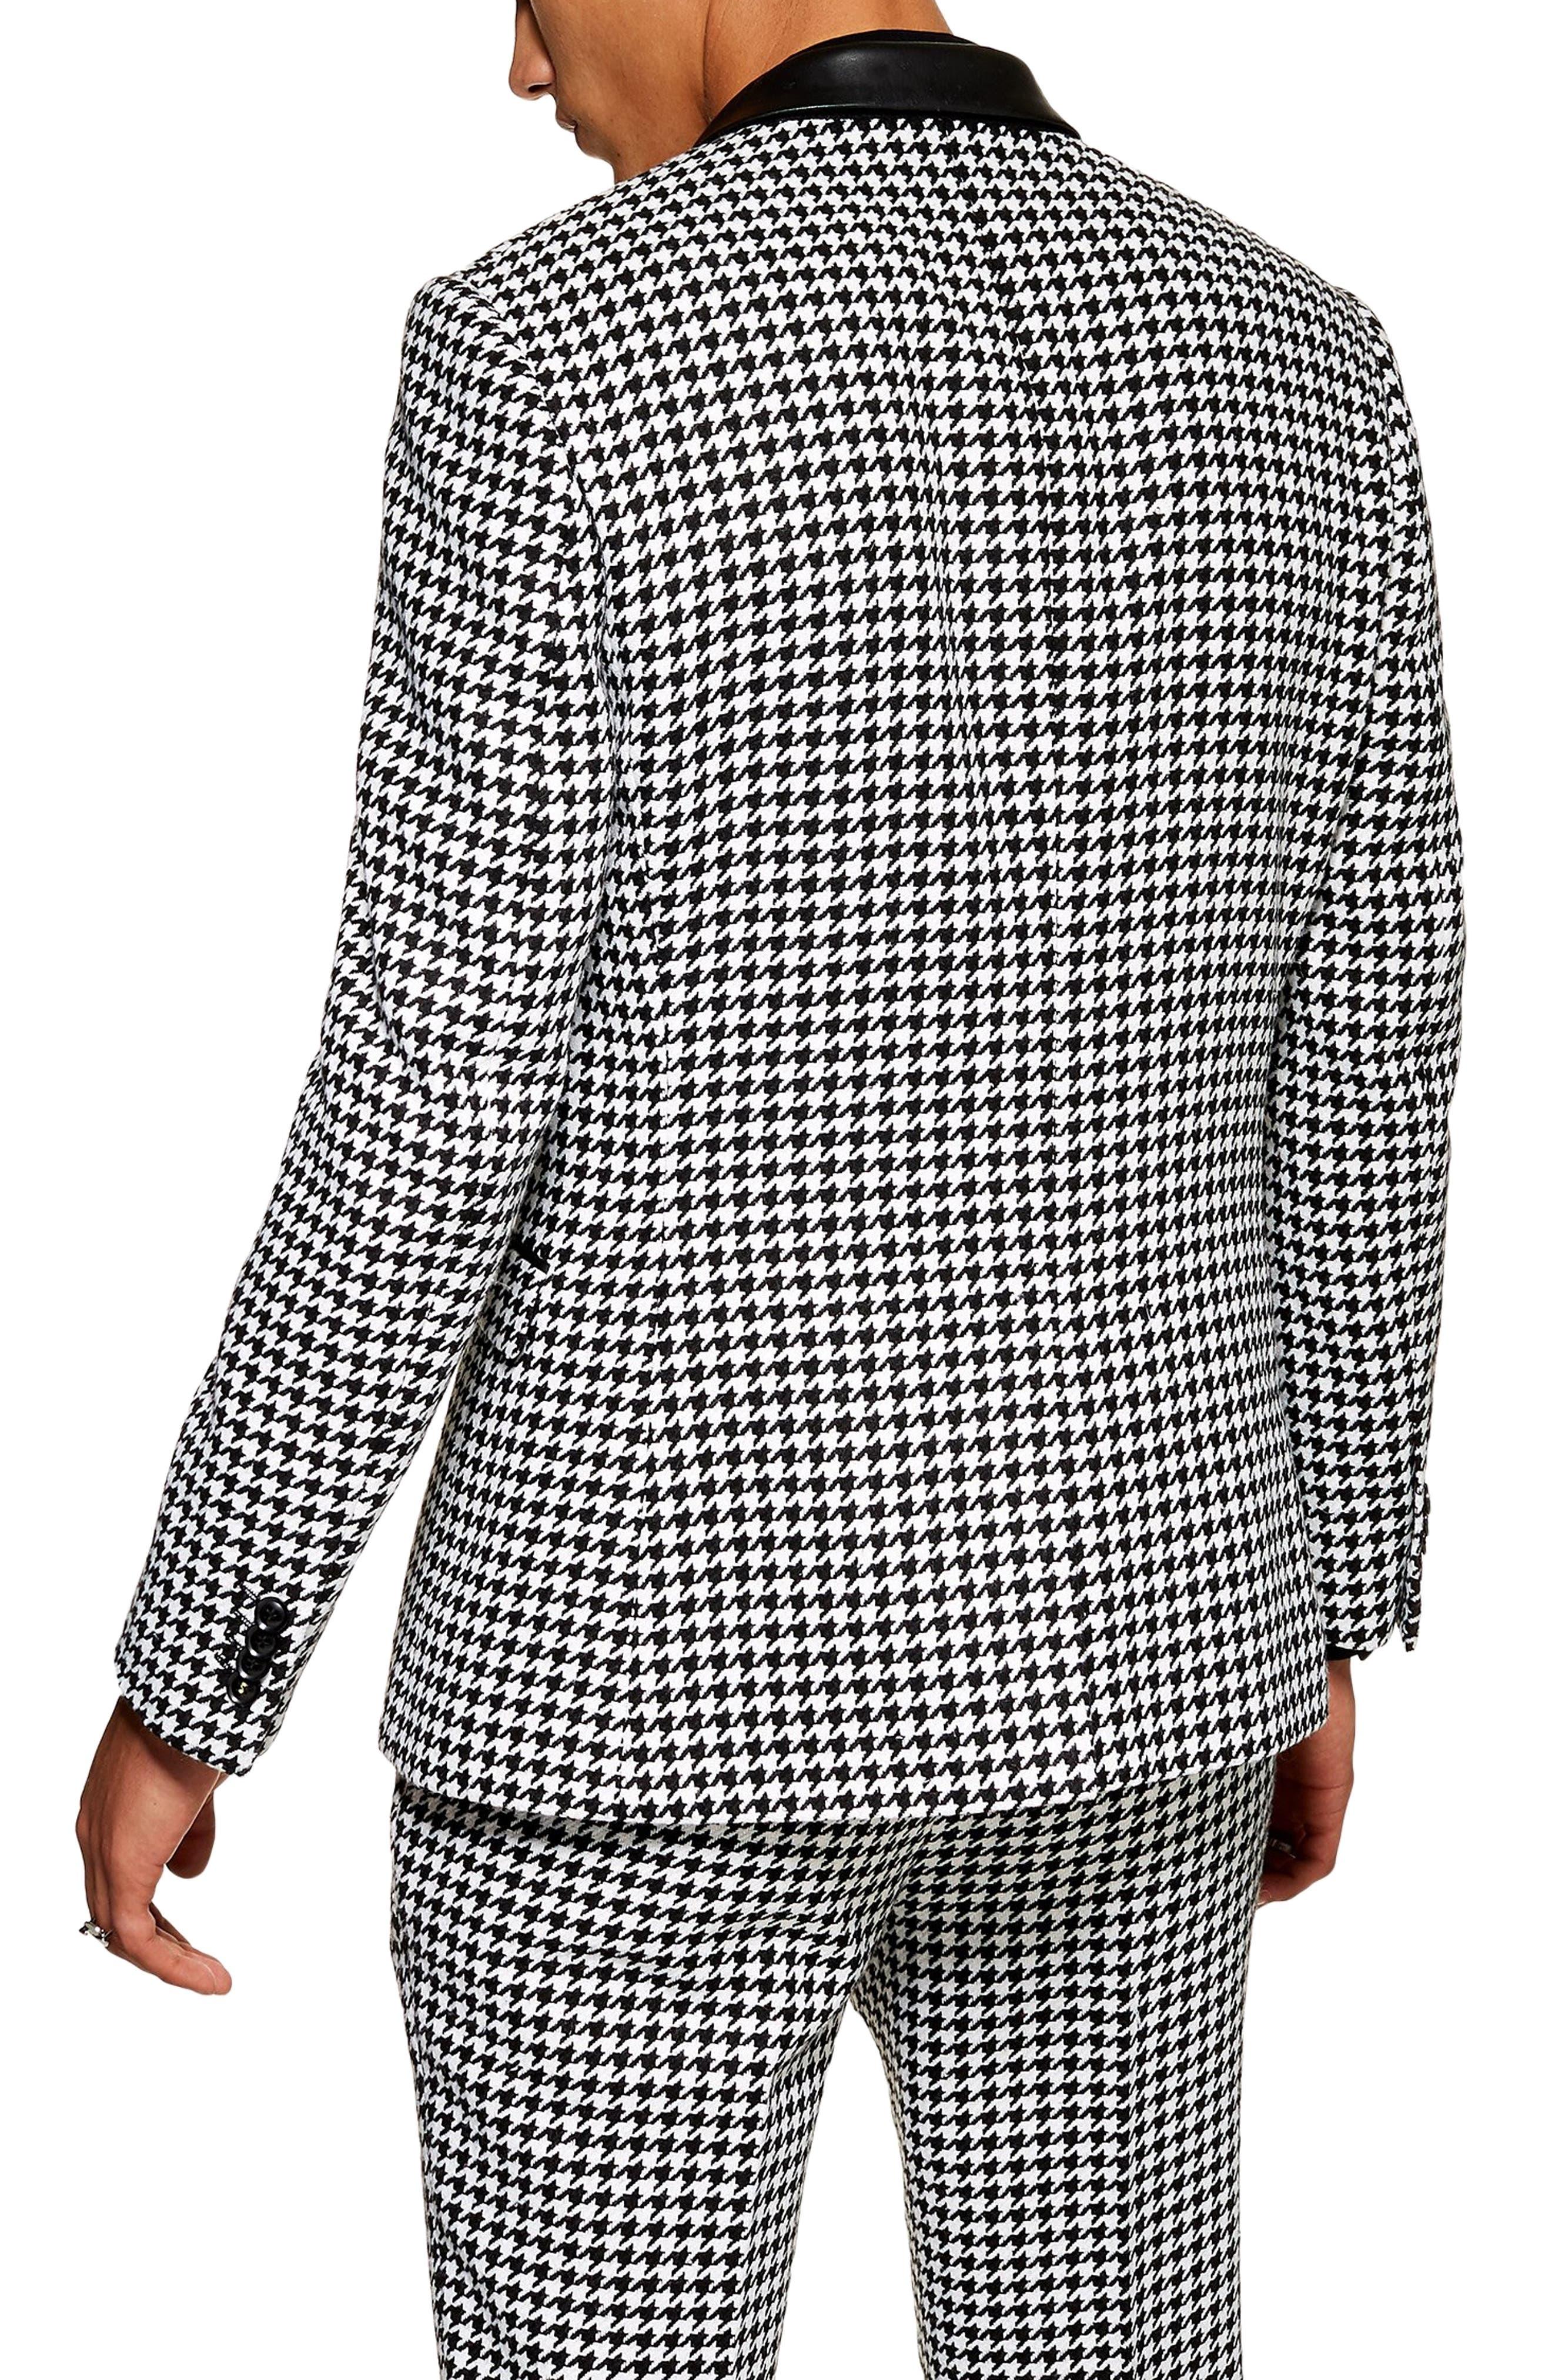 TOPMAN, Roe Skinny Fit Suit Jacket, Alternate thumbnail 2, color, 001